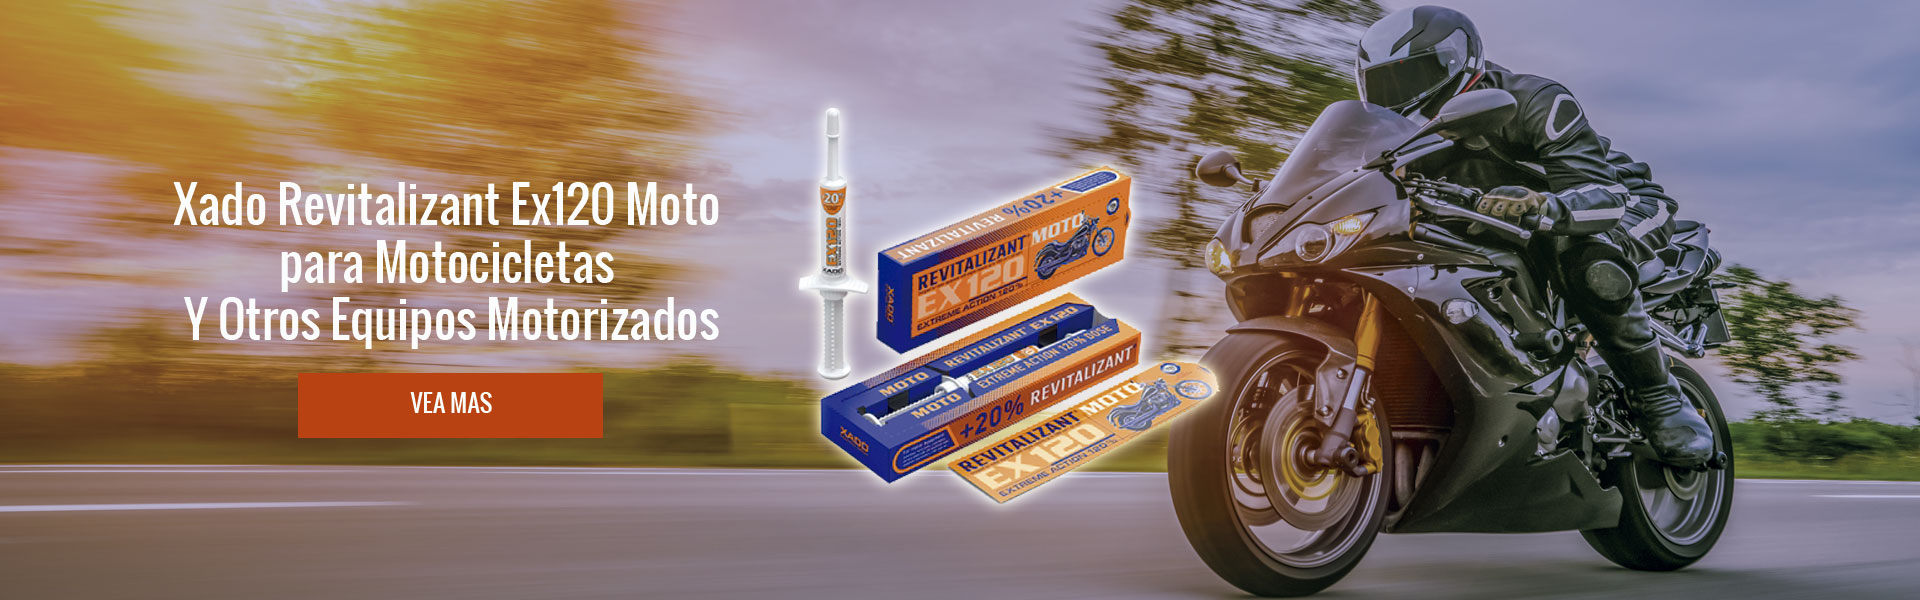 XADO REVITALIZANT EX120 MOTO PARA MOTOCICLETAS